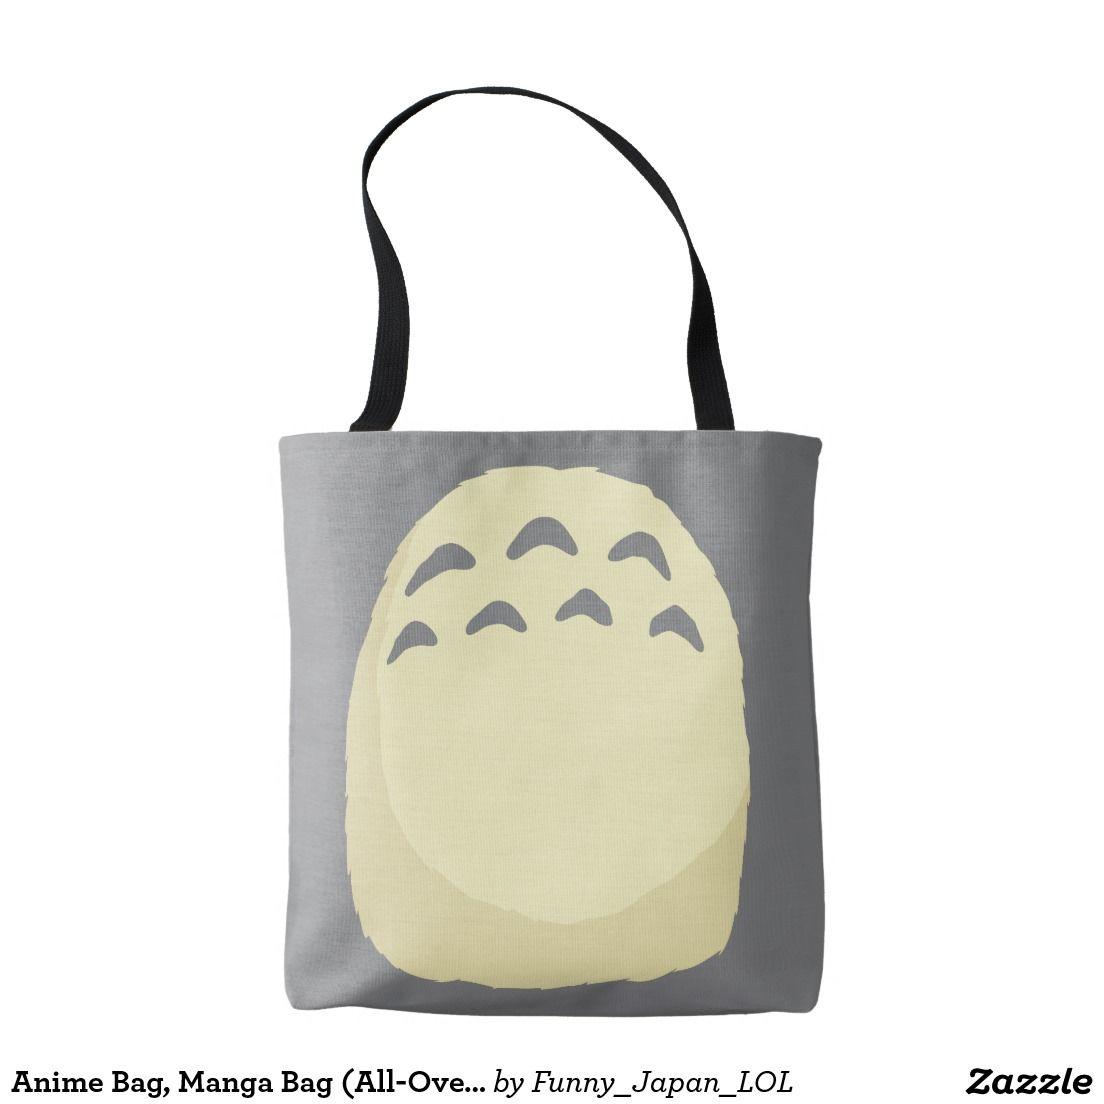 Anime bag manga bag alloverprint tote bag zazzle